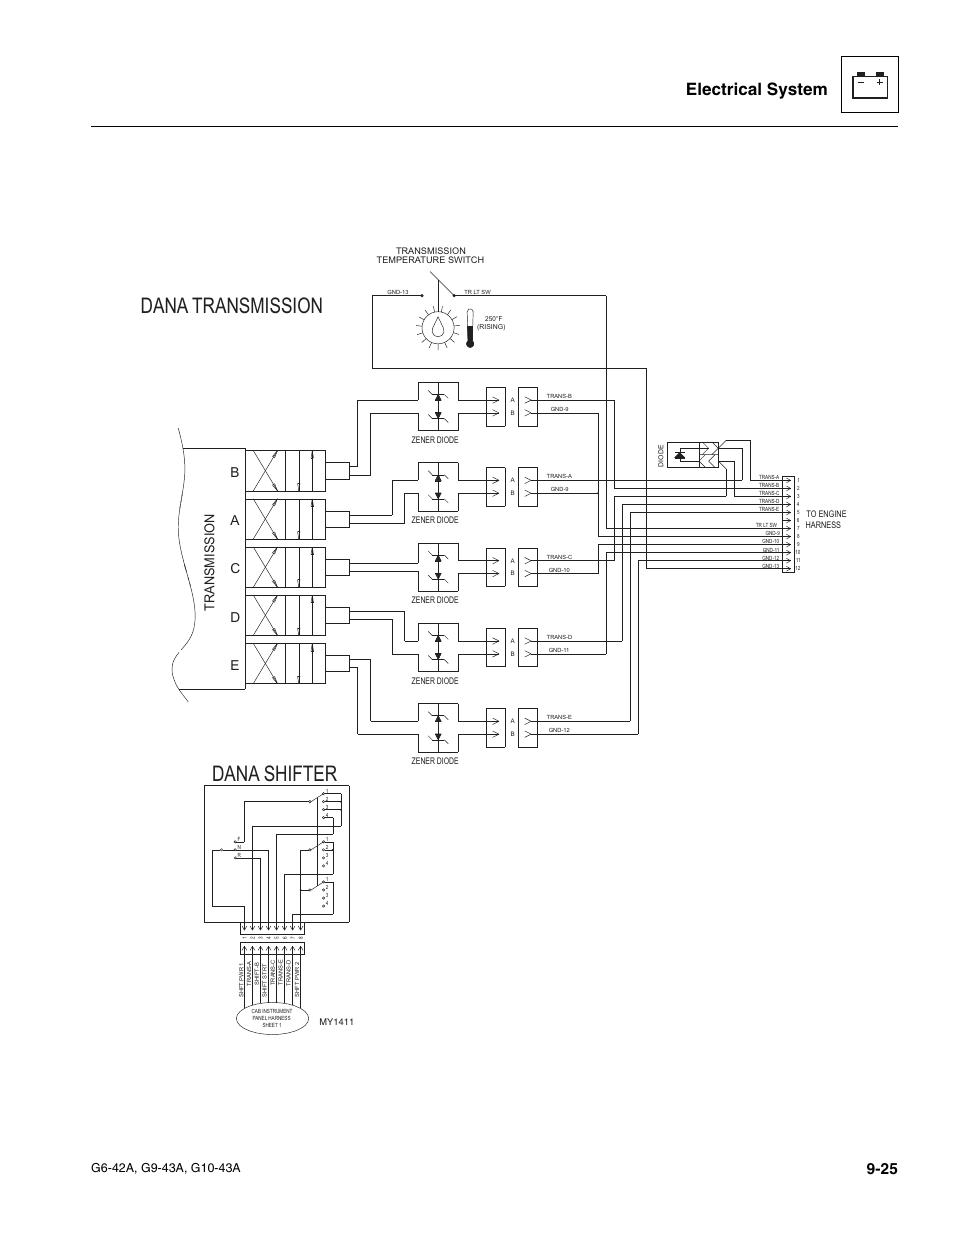 medium resolution of dana transmission dana shifter electrical system jlg g6 42a service manual user manual